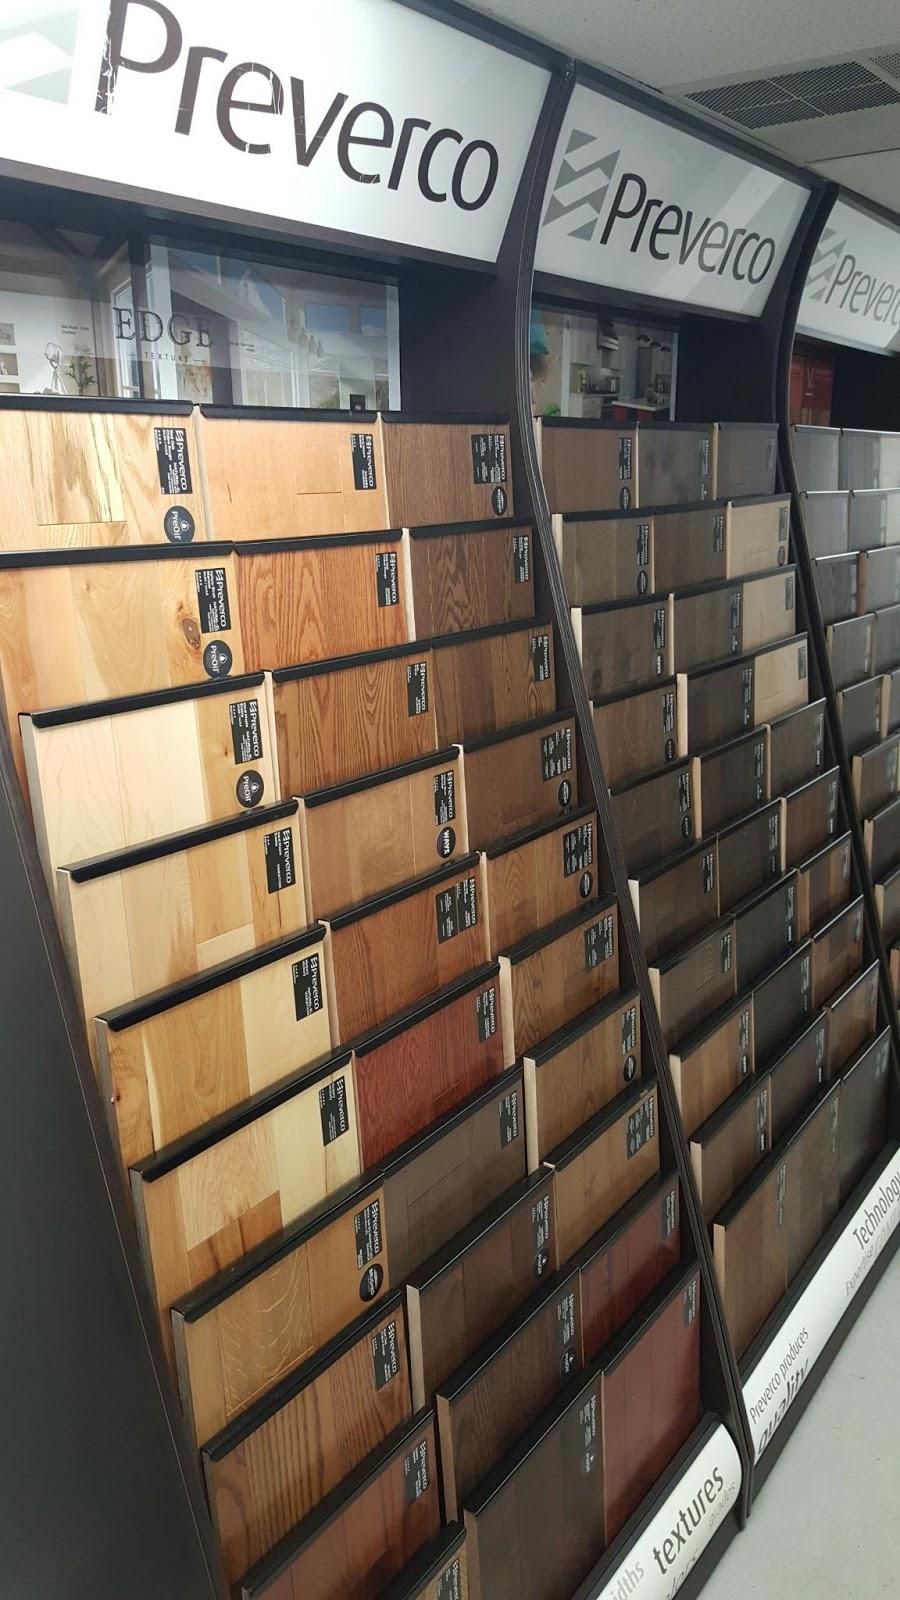 New Preverco Hardwood Flooring Display Edison Nj